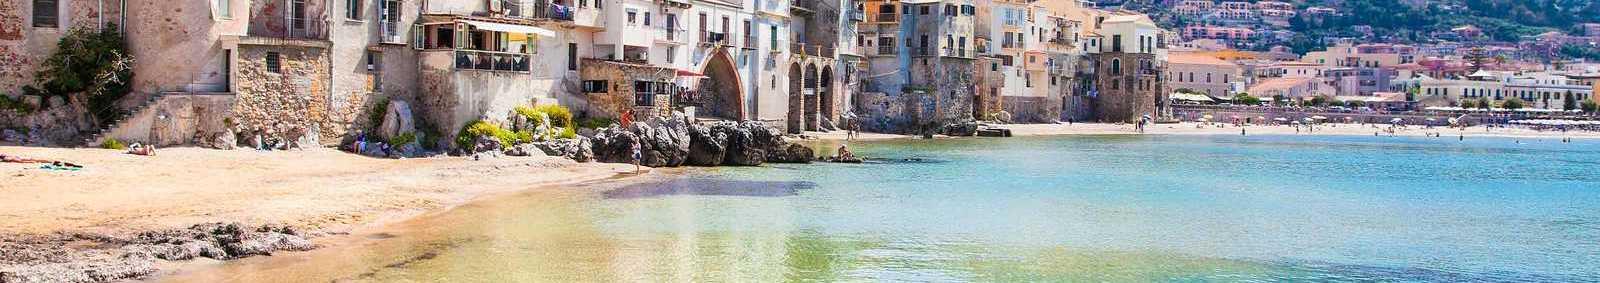 harbour in sicily